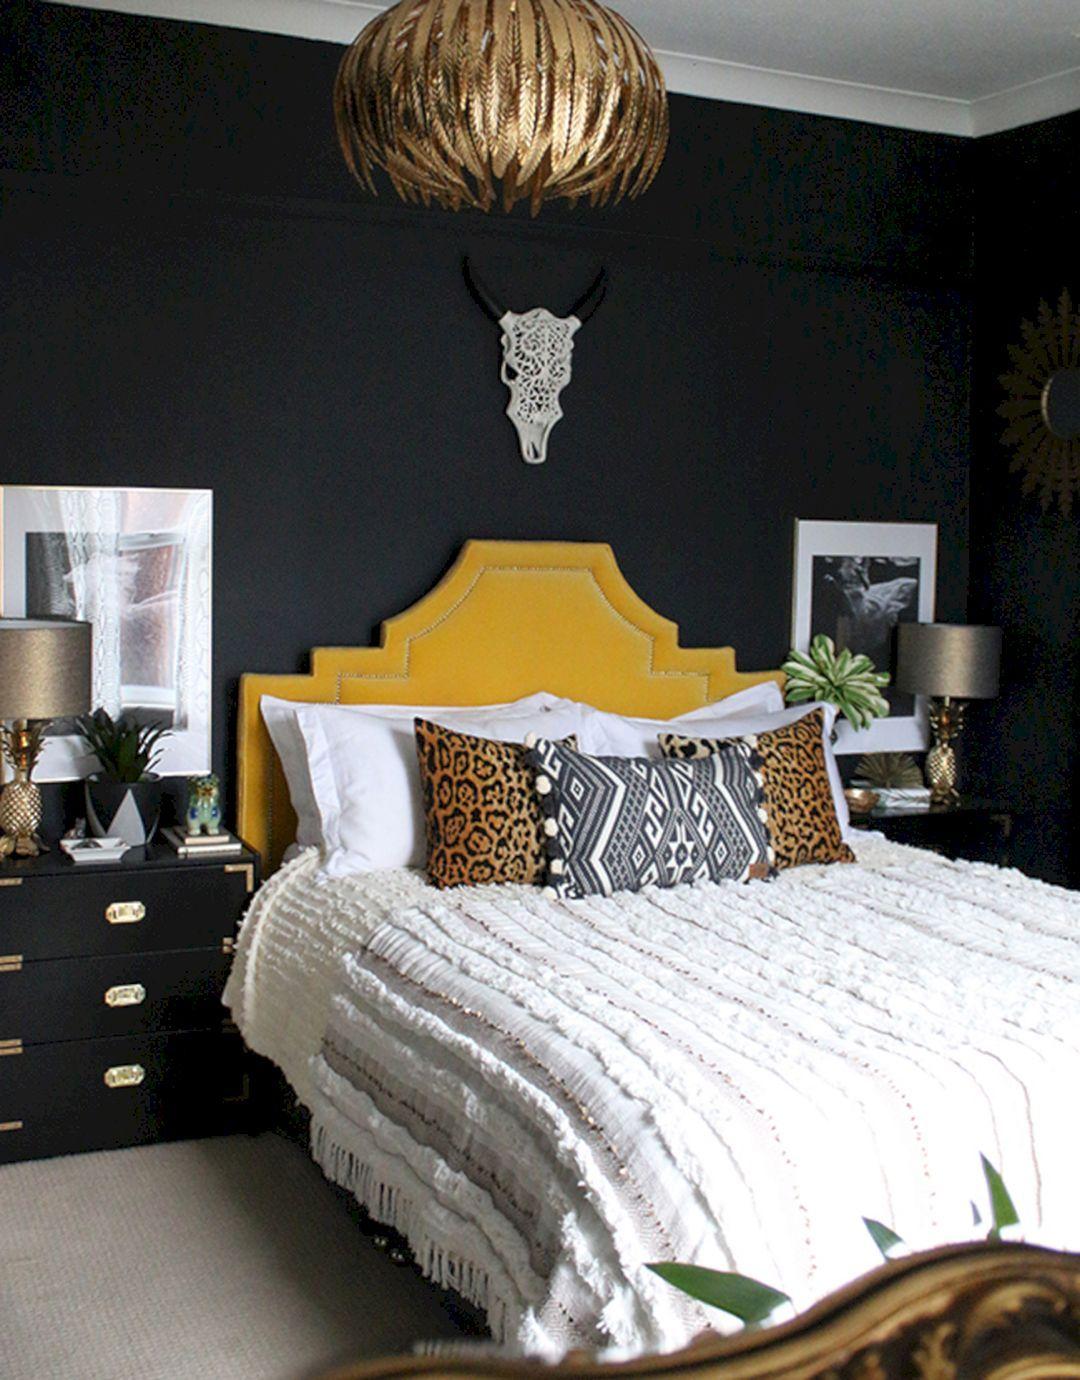 Outstanding Amazing 25 Boho Glam Bedroom Ideas To Inspire You Https Decoredo Com 20557 Amazing 25 Boho Glam Bedr Glam Bedroom Bedroom Design Eclectic Bedroom Boho glam bedroom ideas